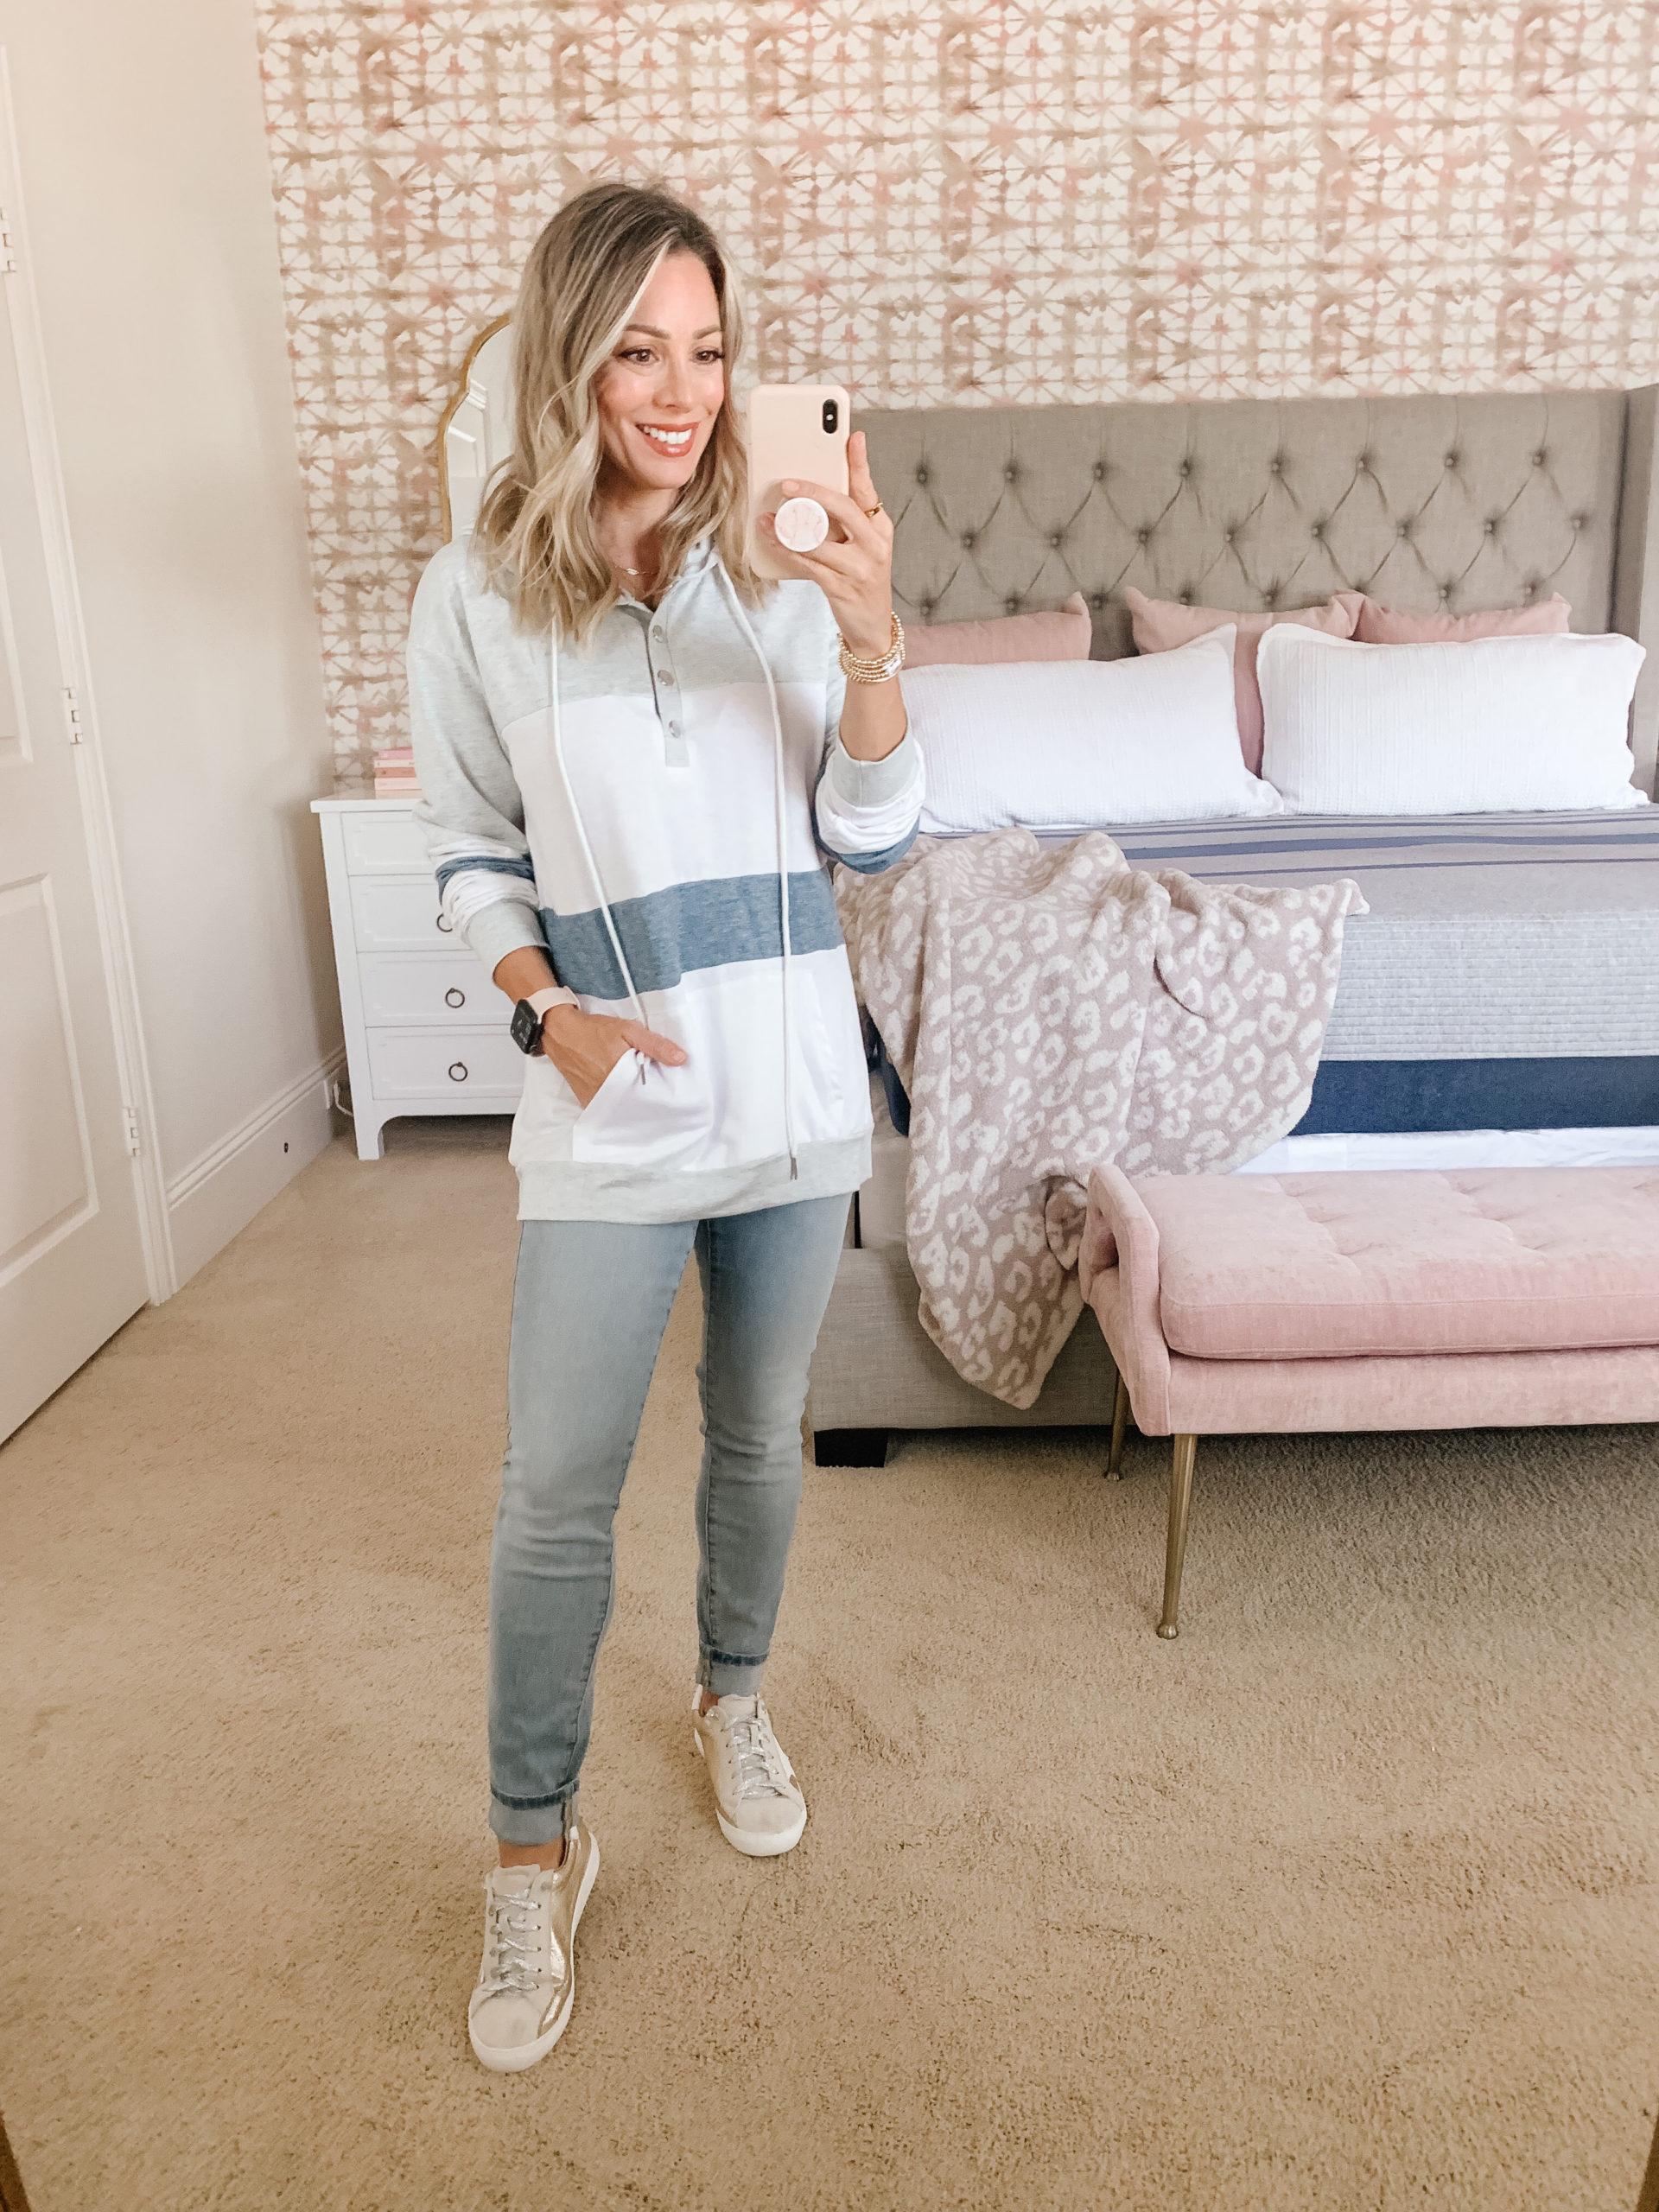 Amazon Fashion, Colorblock Sweatshirt, Jeans, Star Sneakers